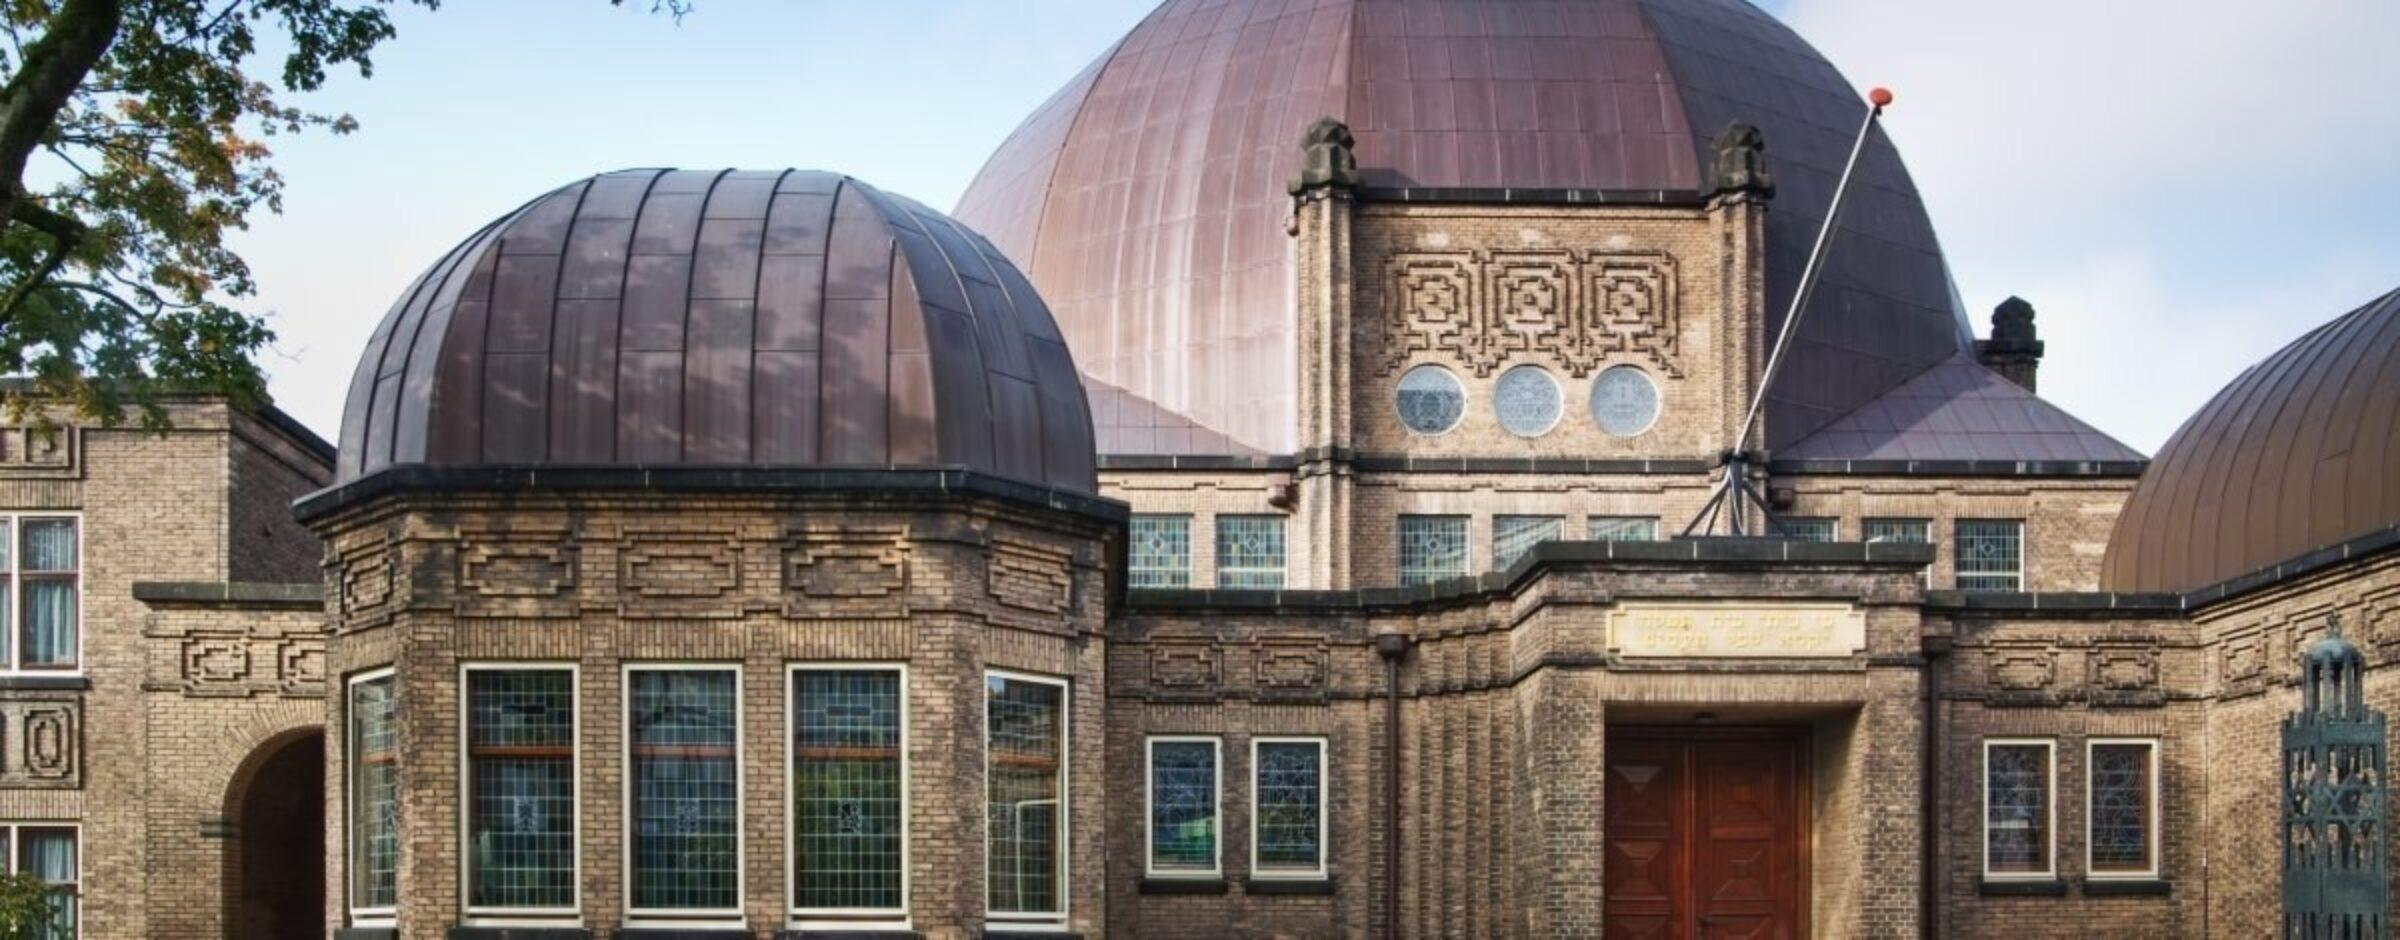 Synagoge 119 1520243555 35hssuukid